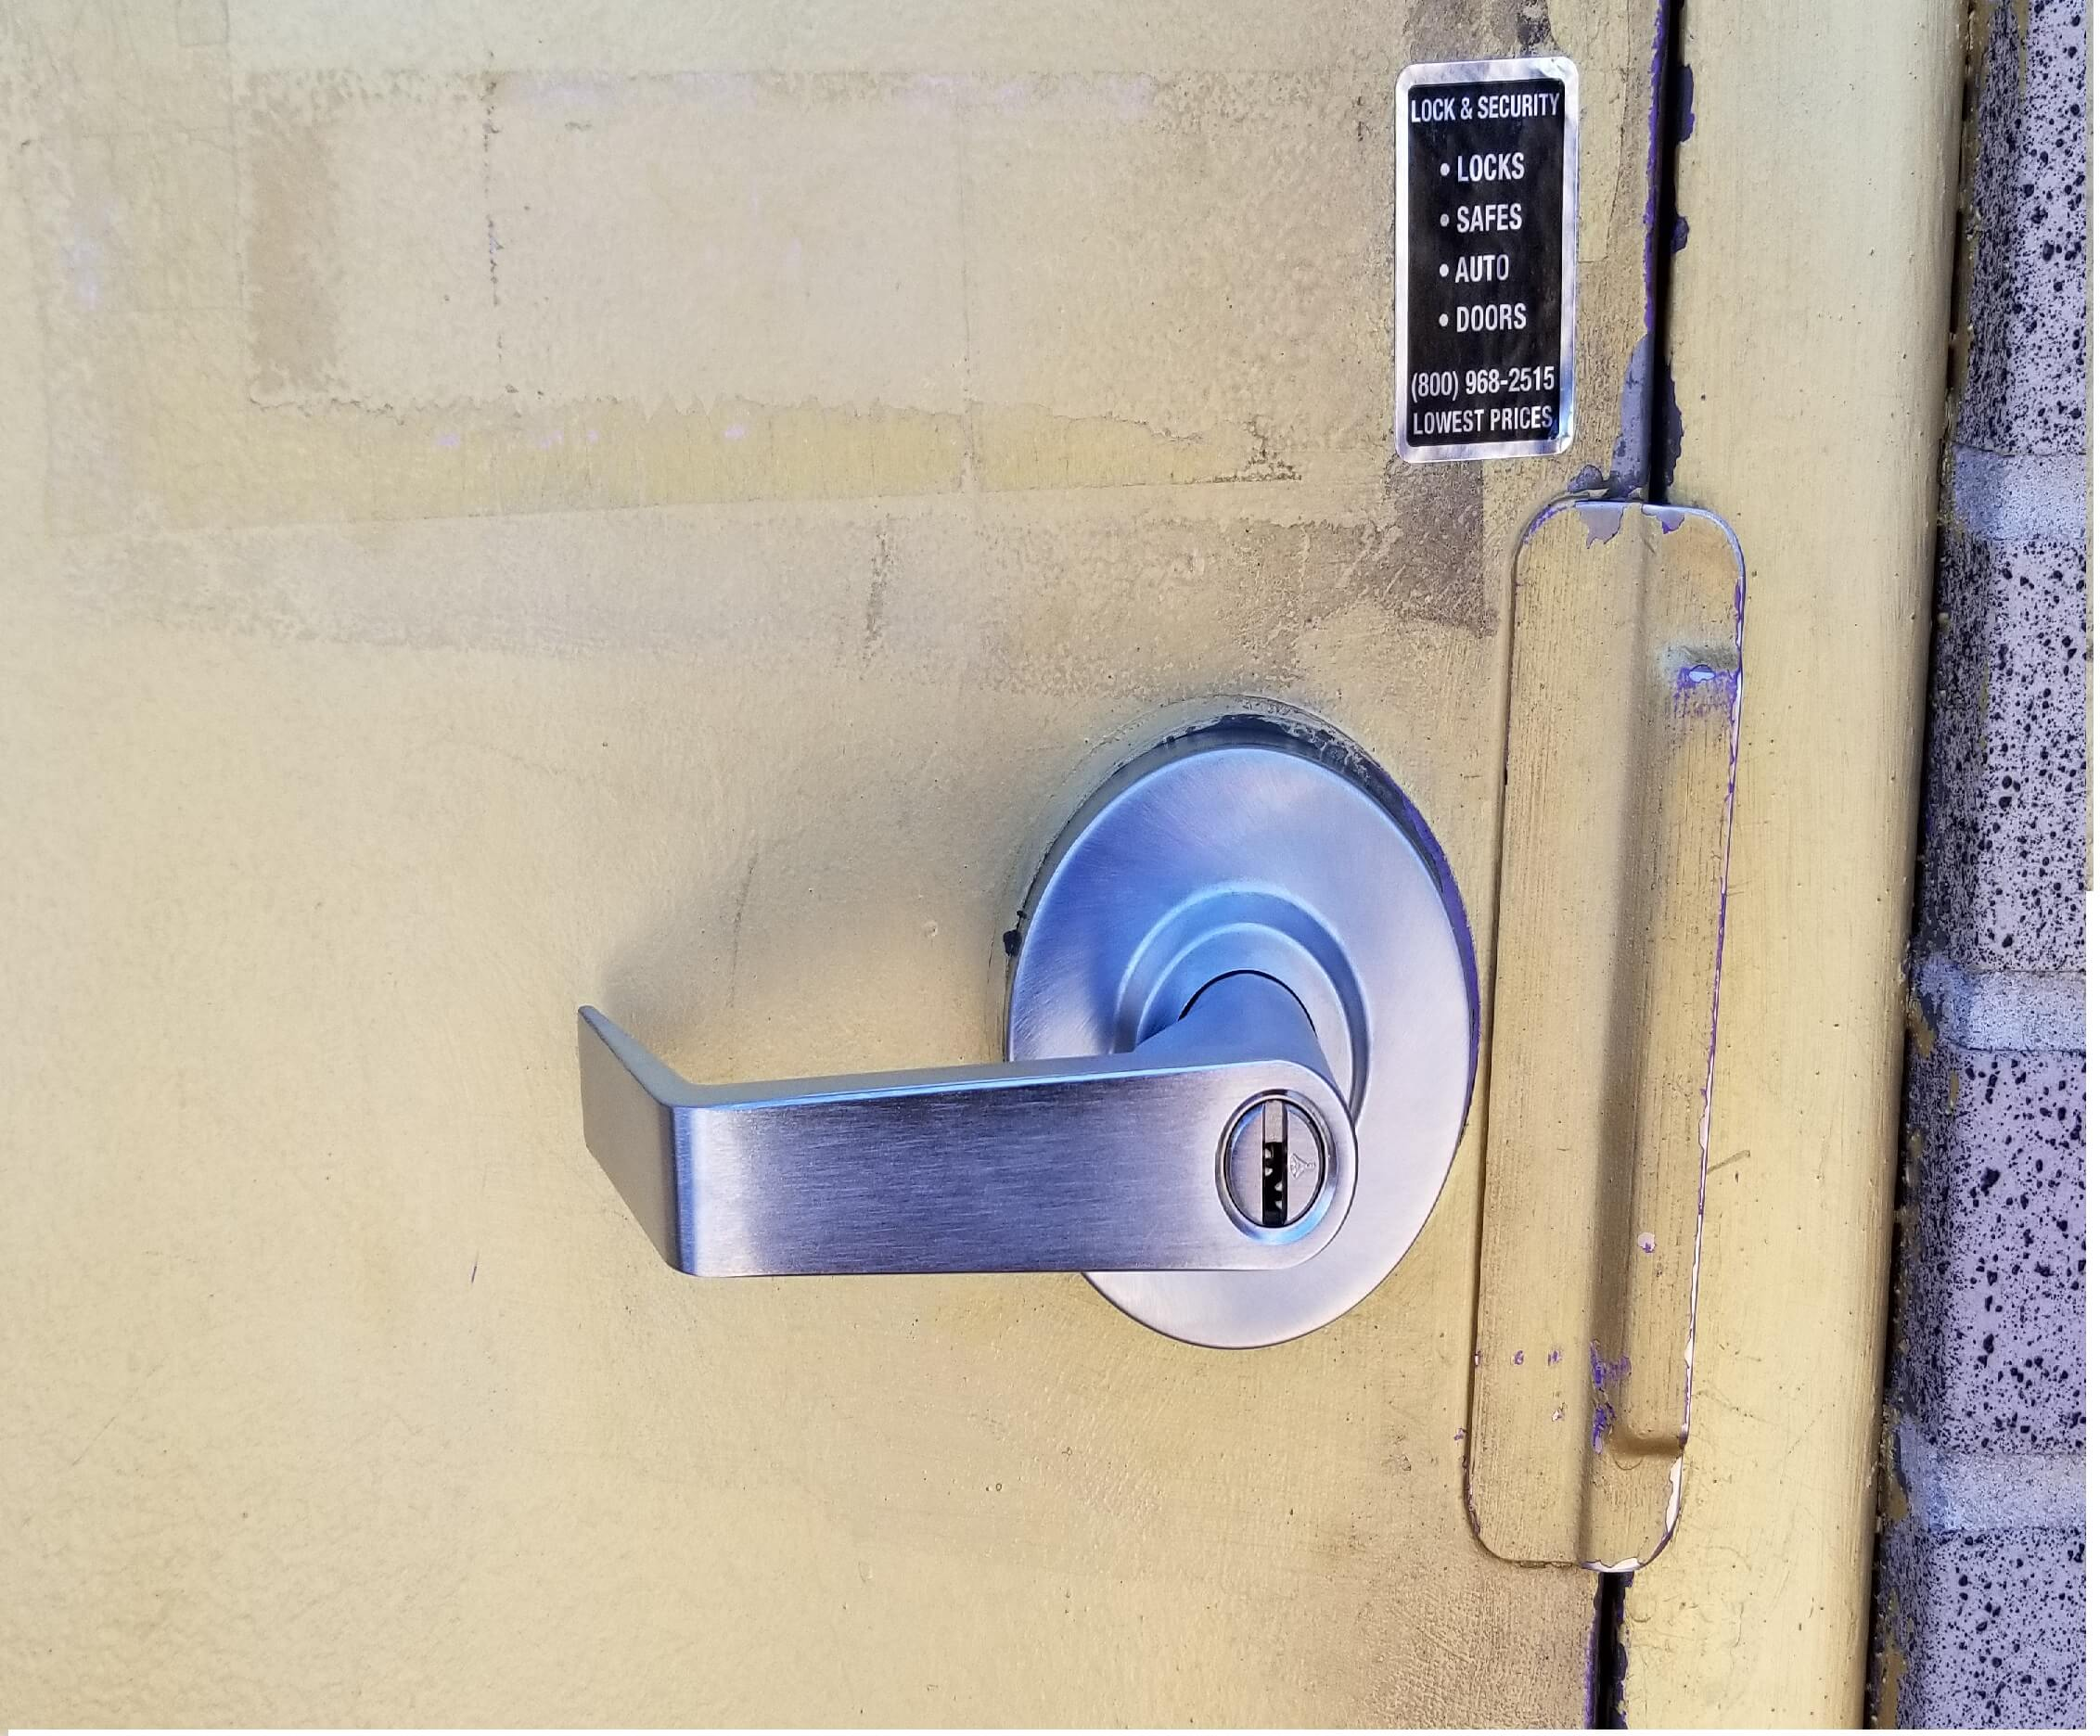 locksmith service in Jamaica, Queens